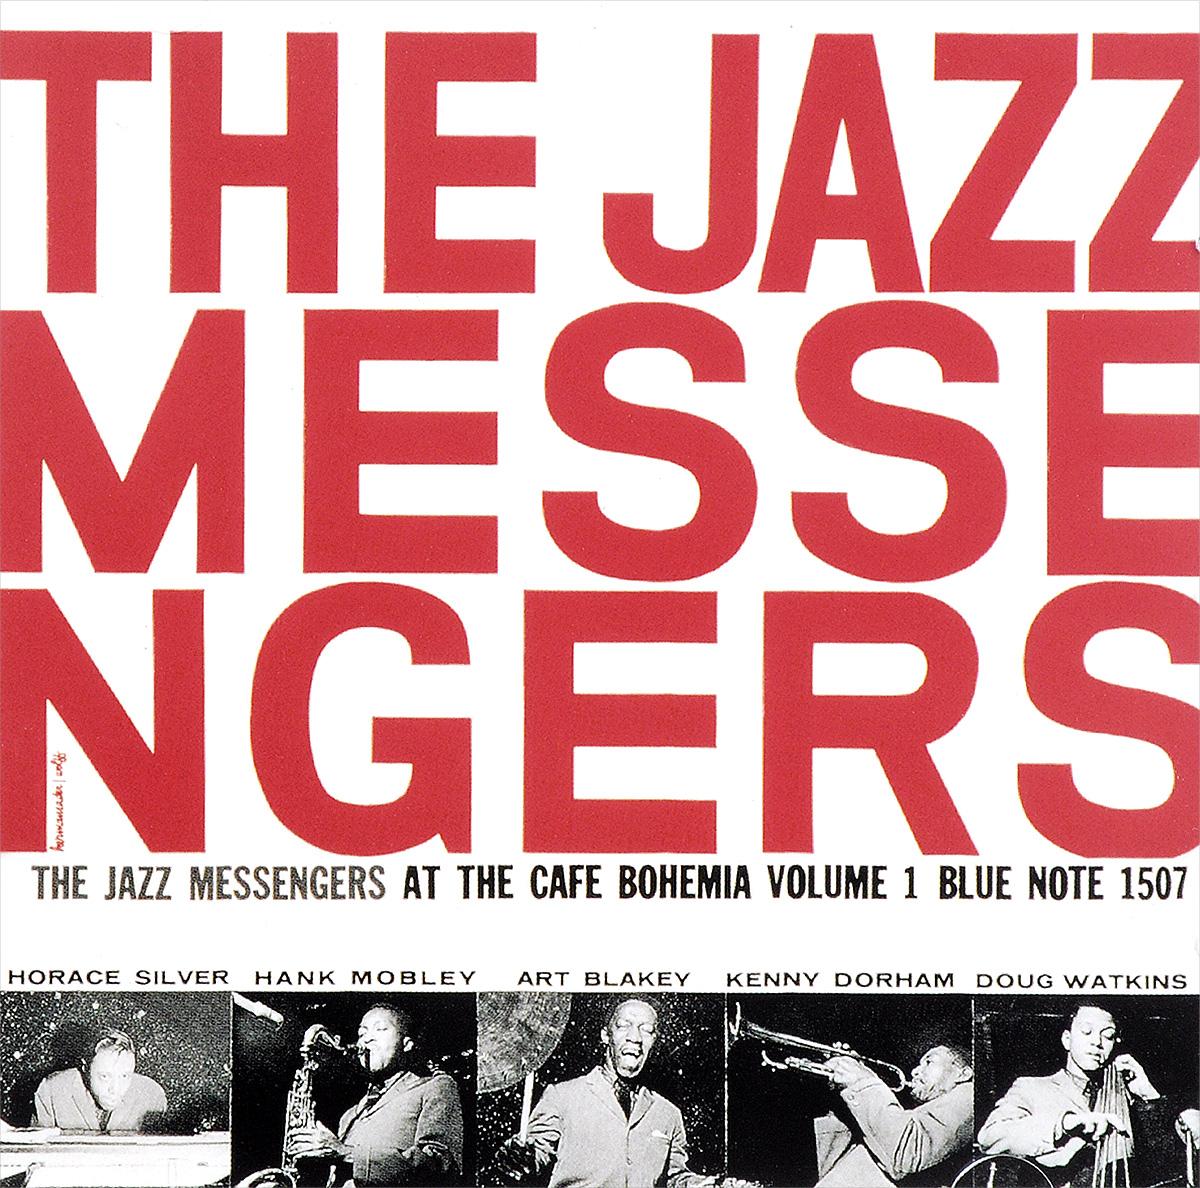 Арт Блэйки,The Jazz Messengers,Кенни Дорхэм,Хэнк Мобли,Хорэс Сильвер,Дуг Уоткинс Art Blakey & The Jazz Messengers. At The Cafe Bohemia, Volume 1 лореаль сильвер